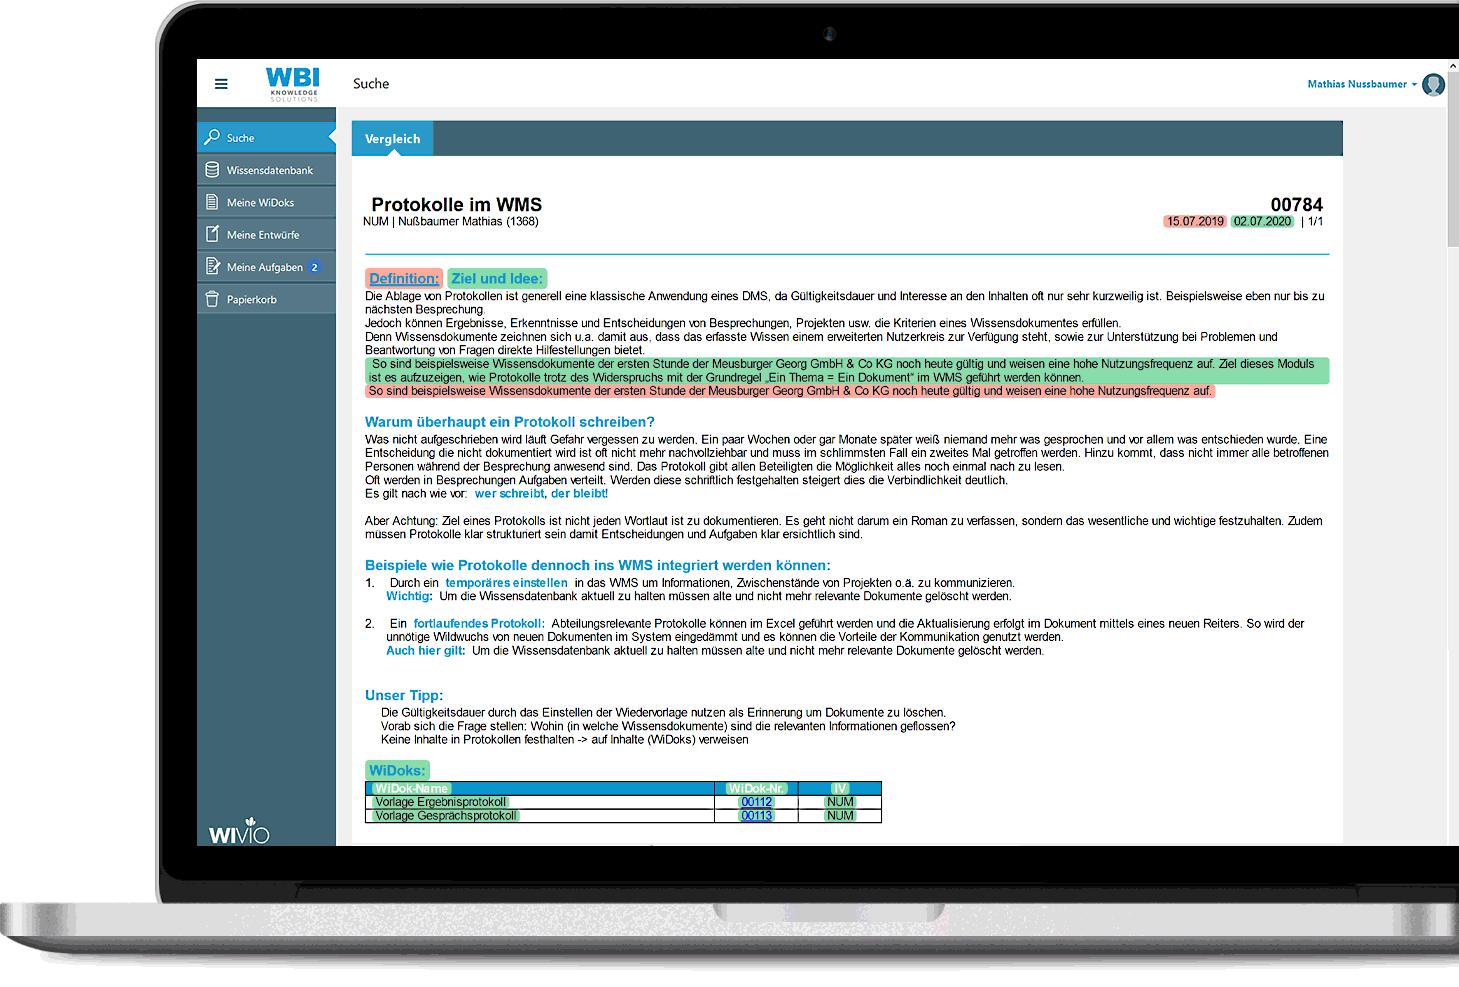 WIVIO-Versionskontrolle-crop-rechts